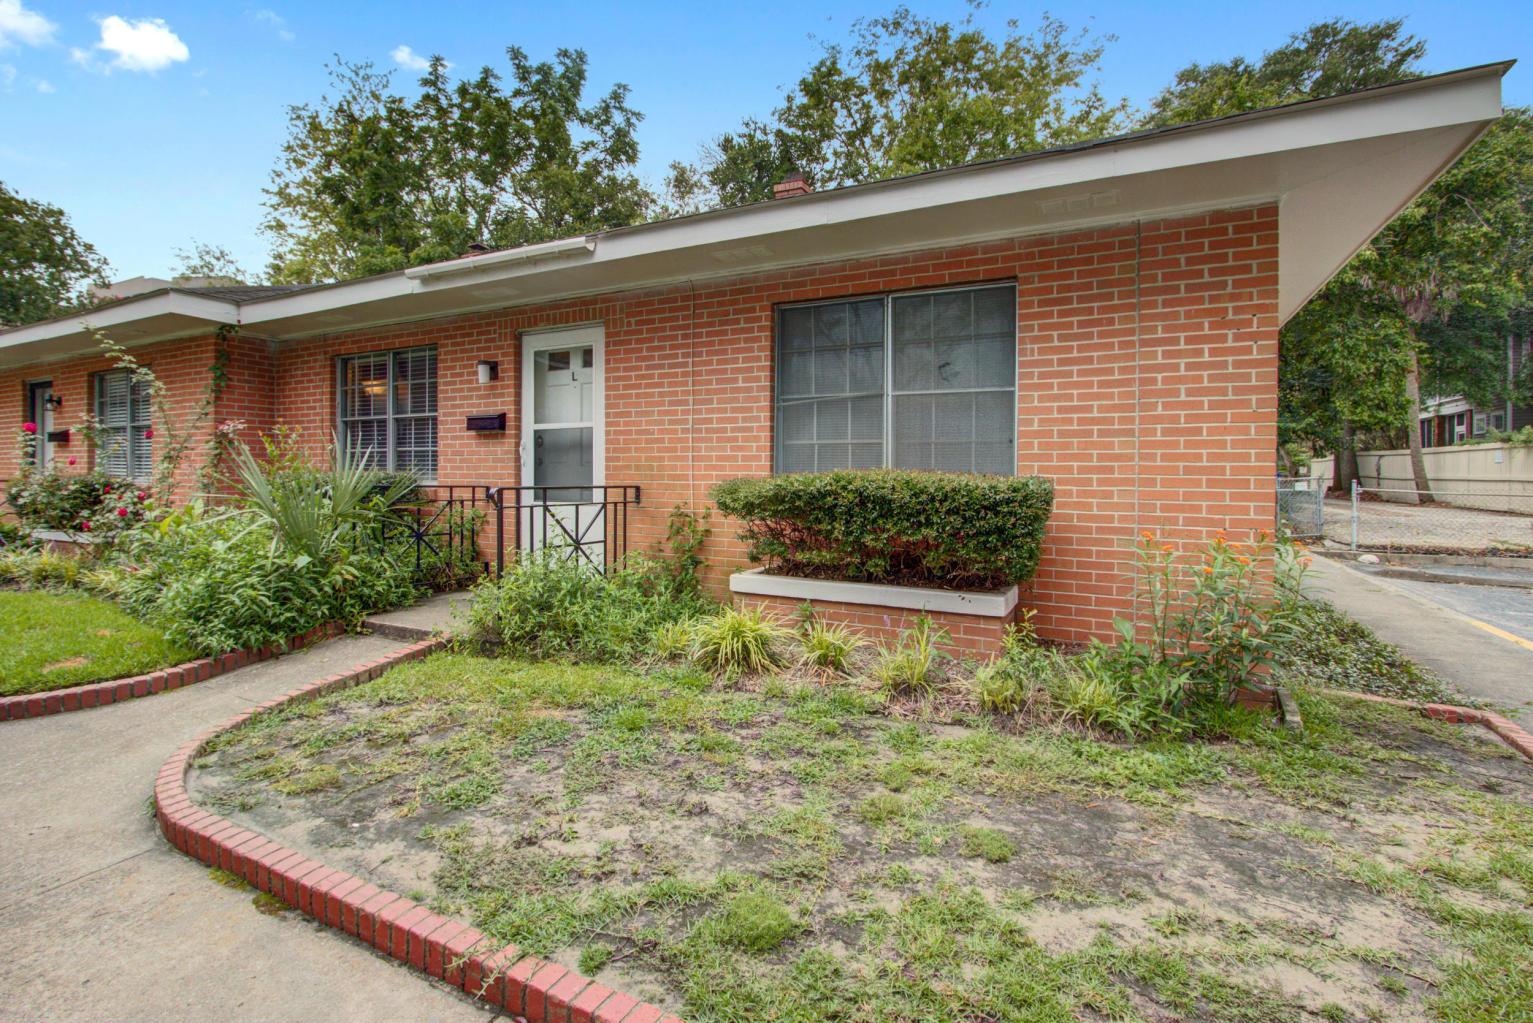 Rutledge Green Condos For Sale - 173 Rutledge, Charleston, SC - 2